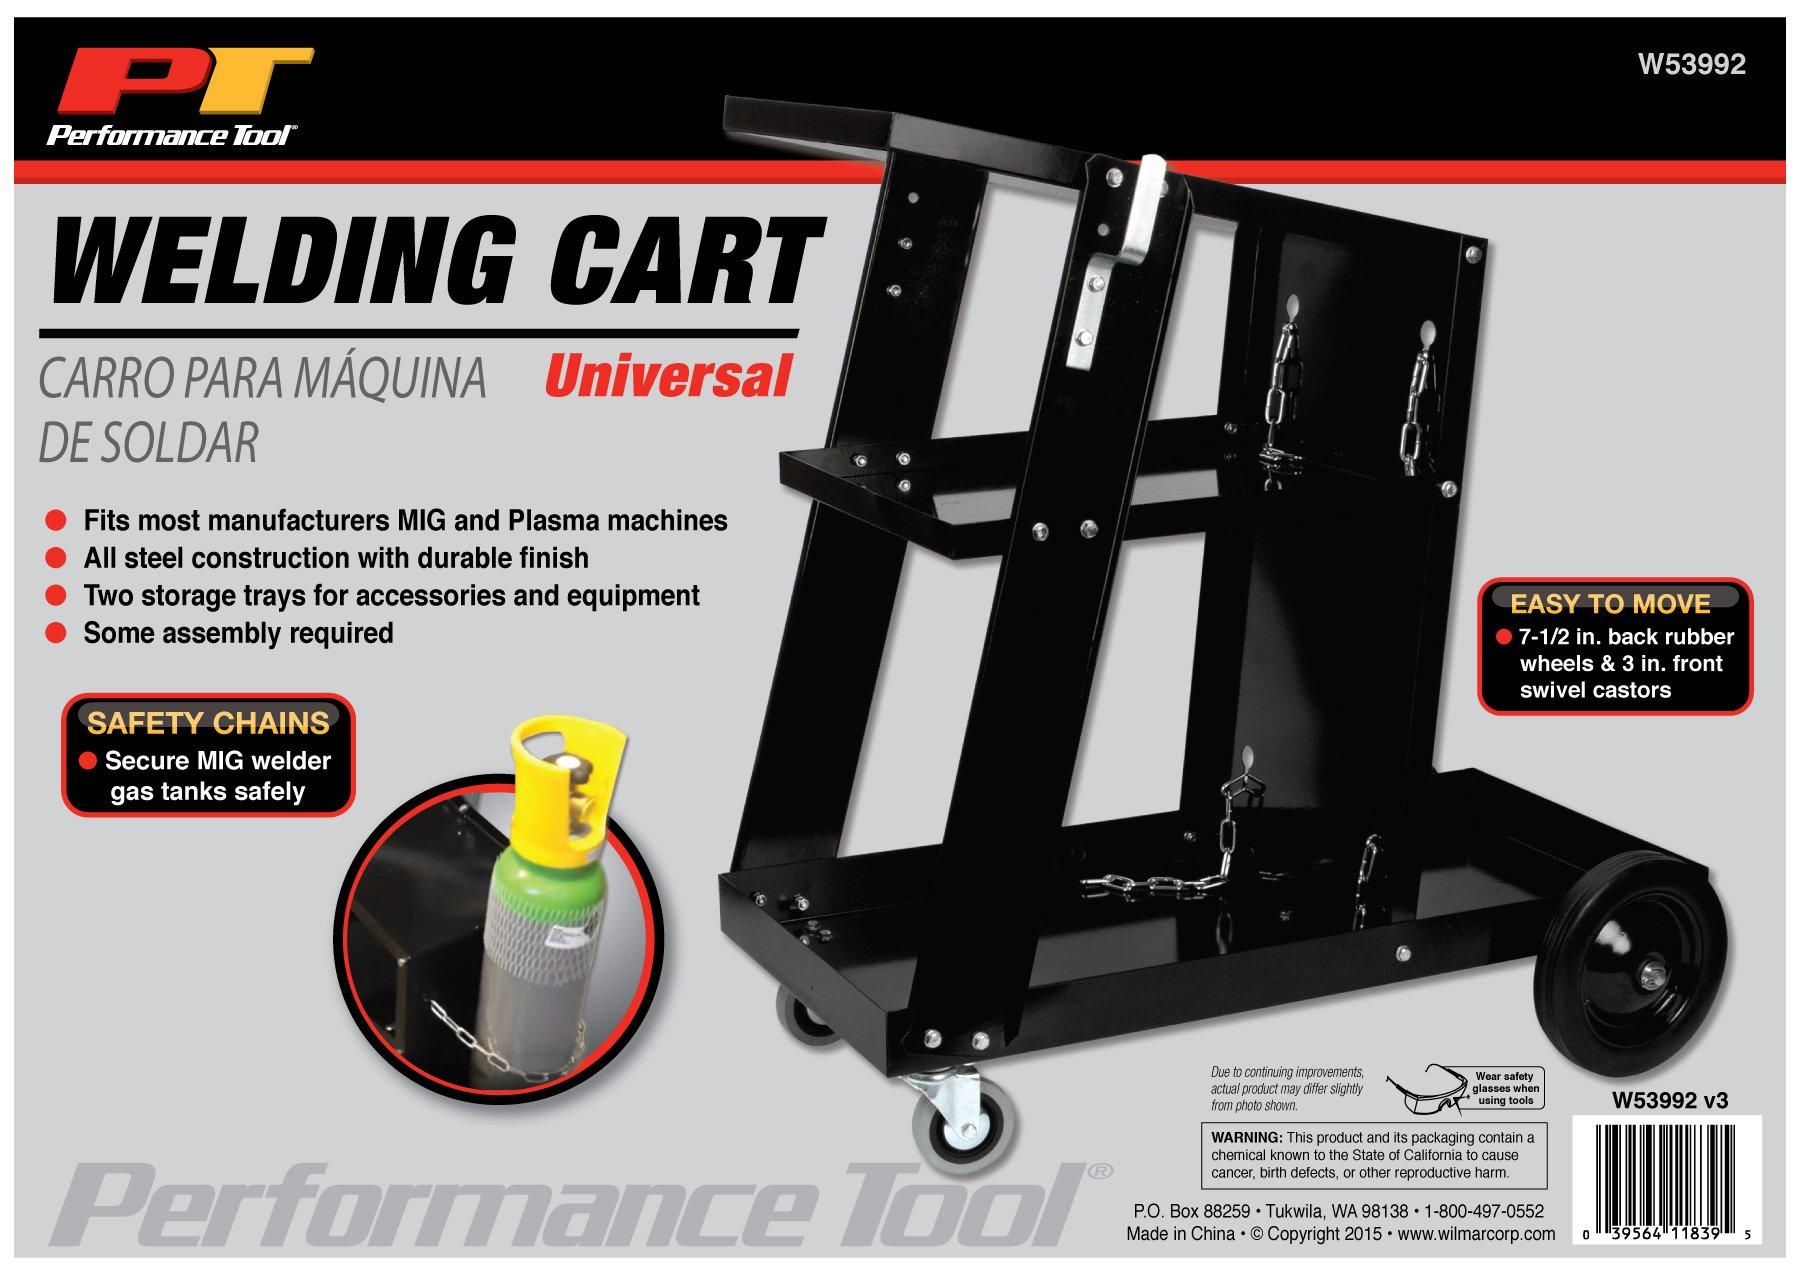 Performance Tool W53992 Welding Cart, Universal, Black Universal Welding Cart by Performance Tool (Image #3)